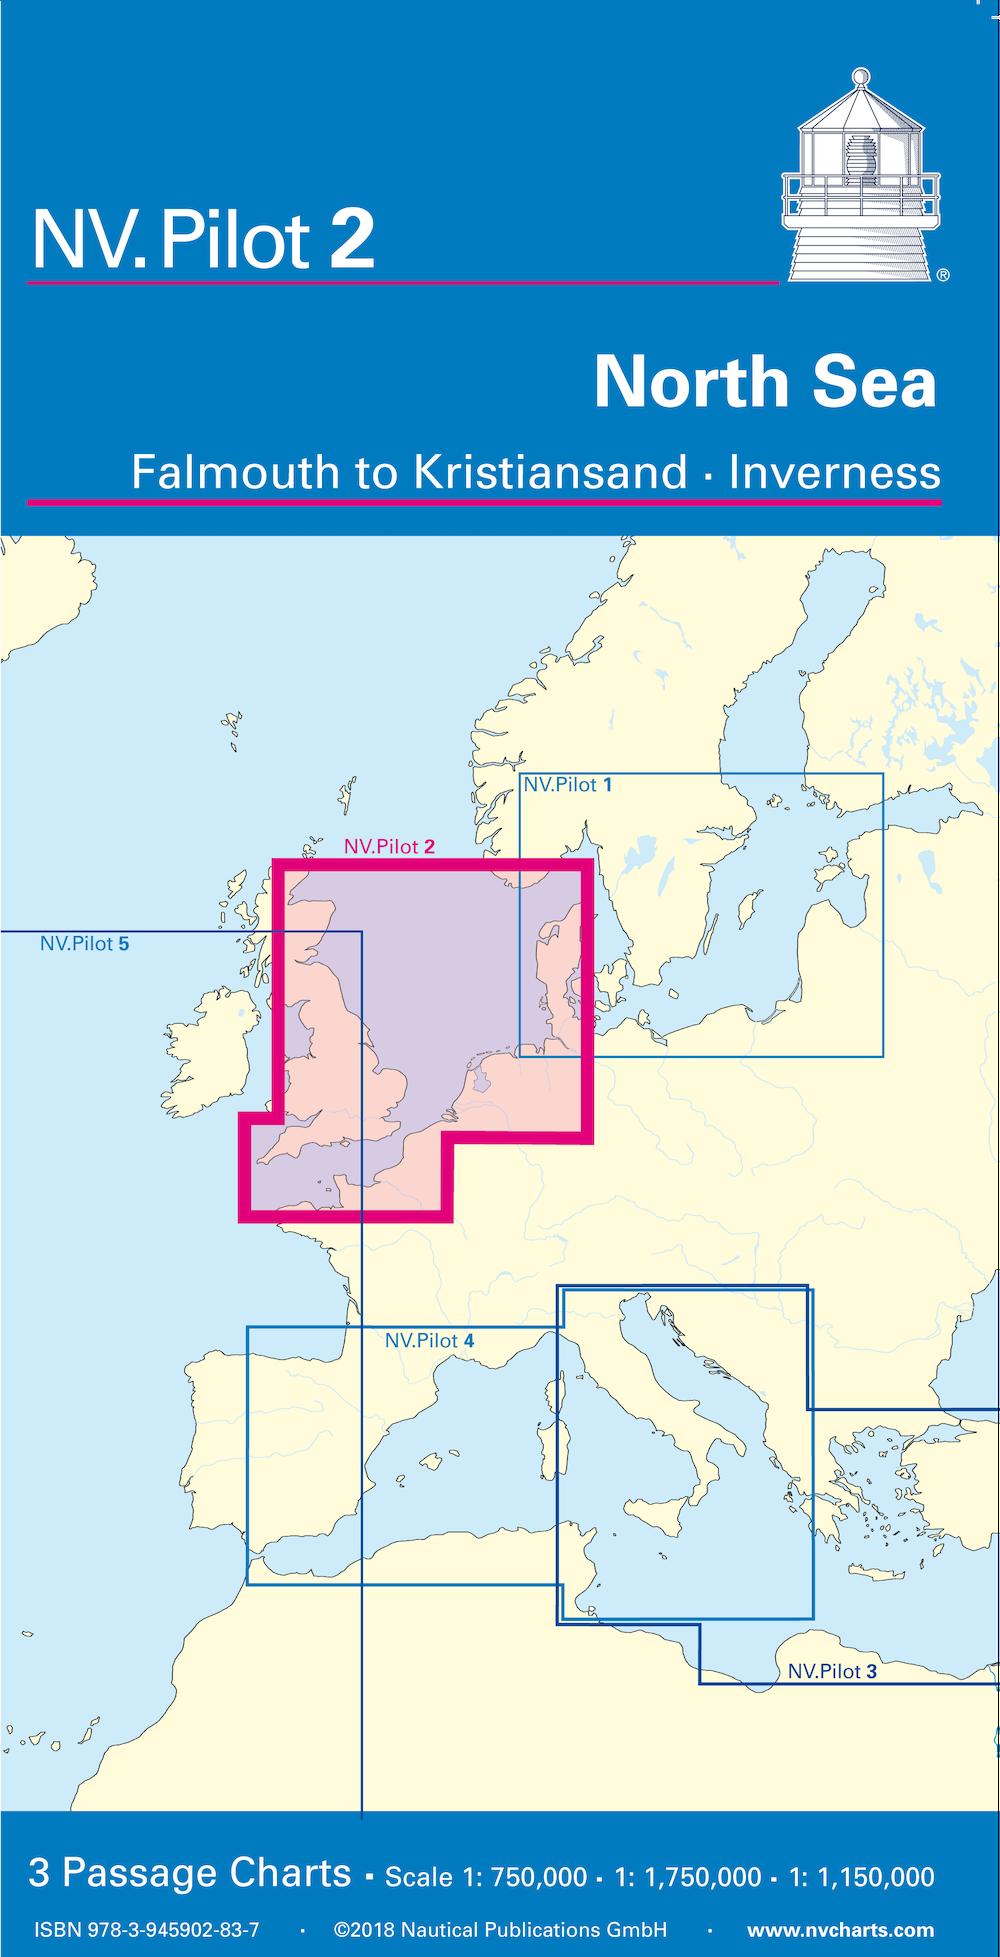 NV Pilot 2 - North Sea - Falmouth to Kristiansand Inverness